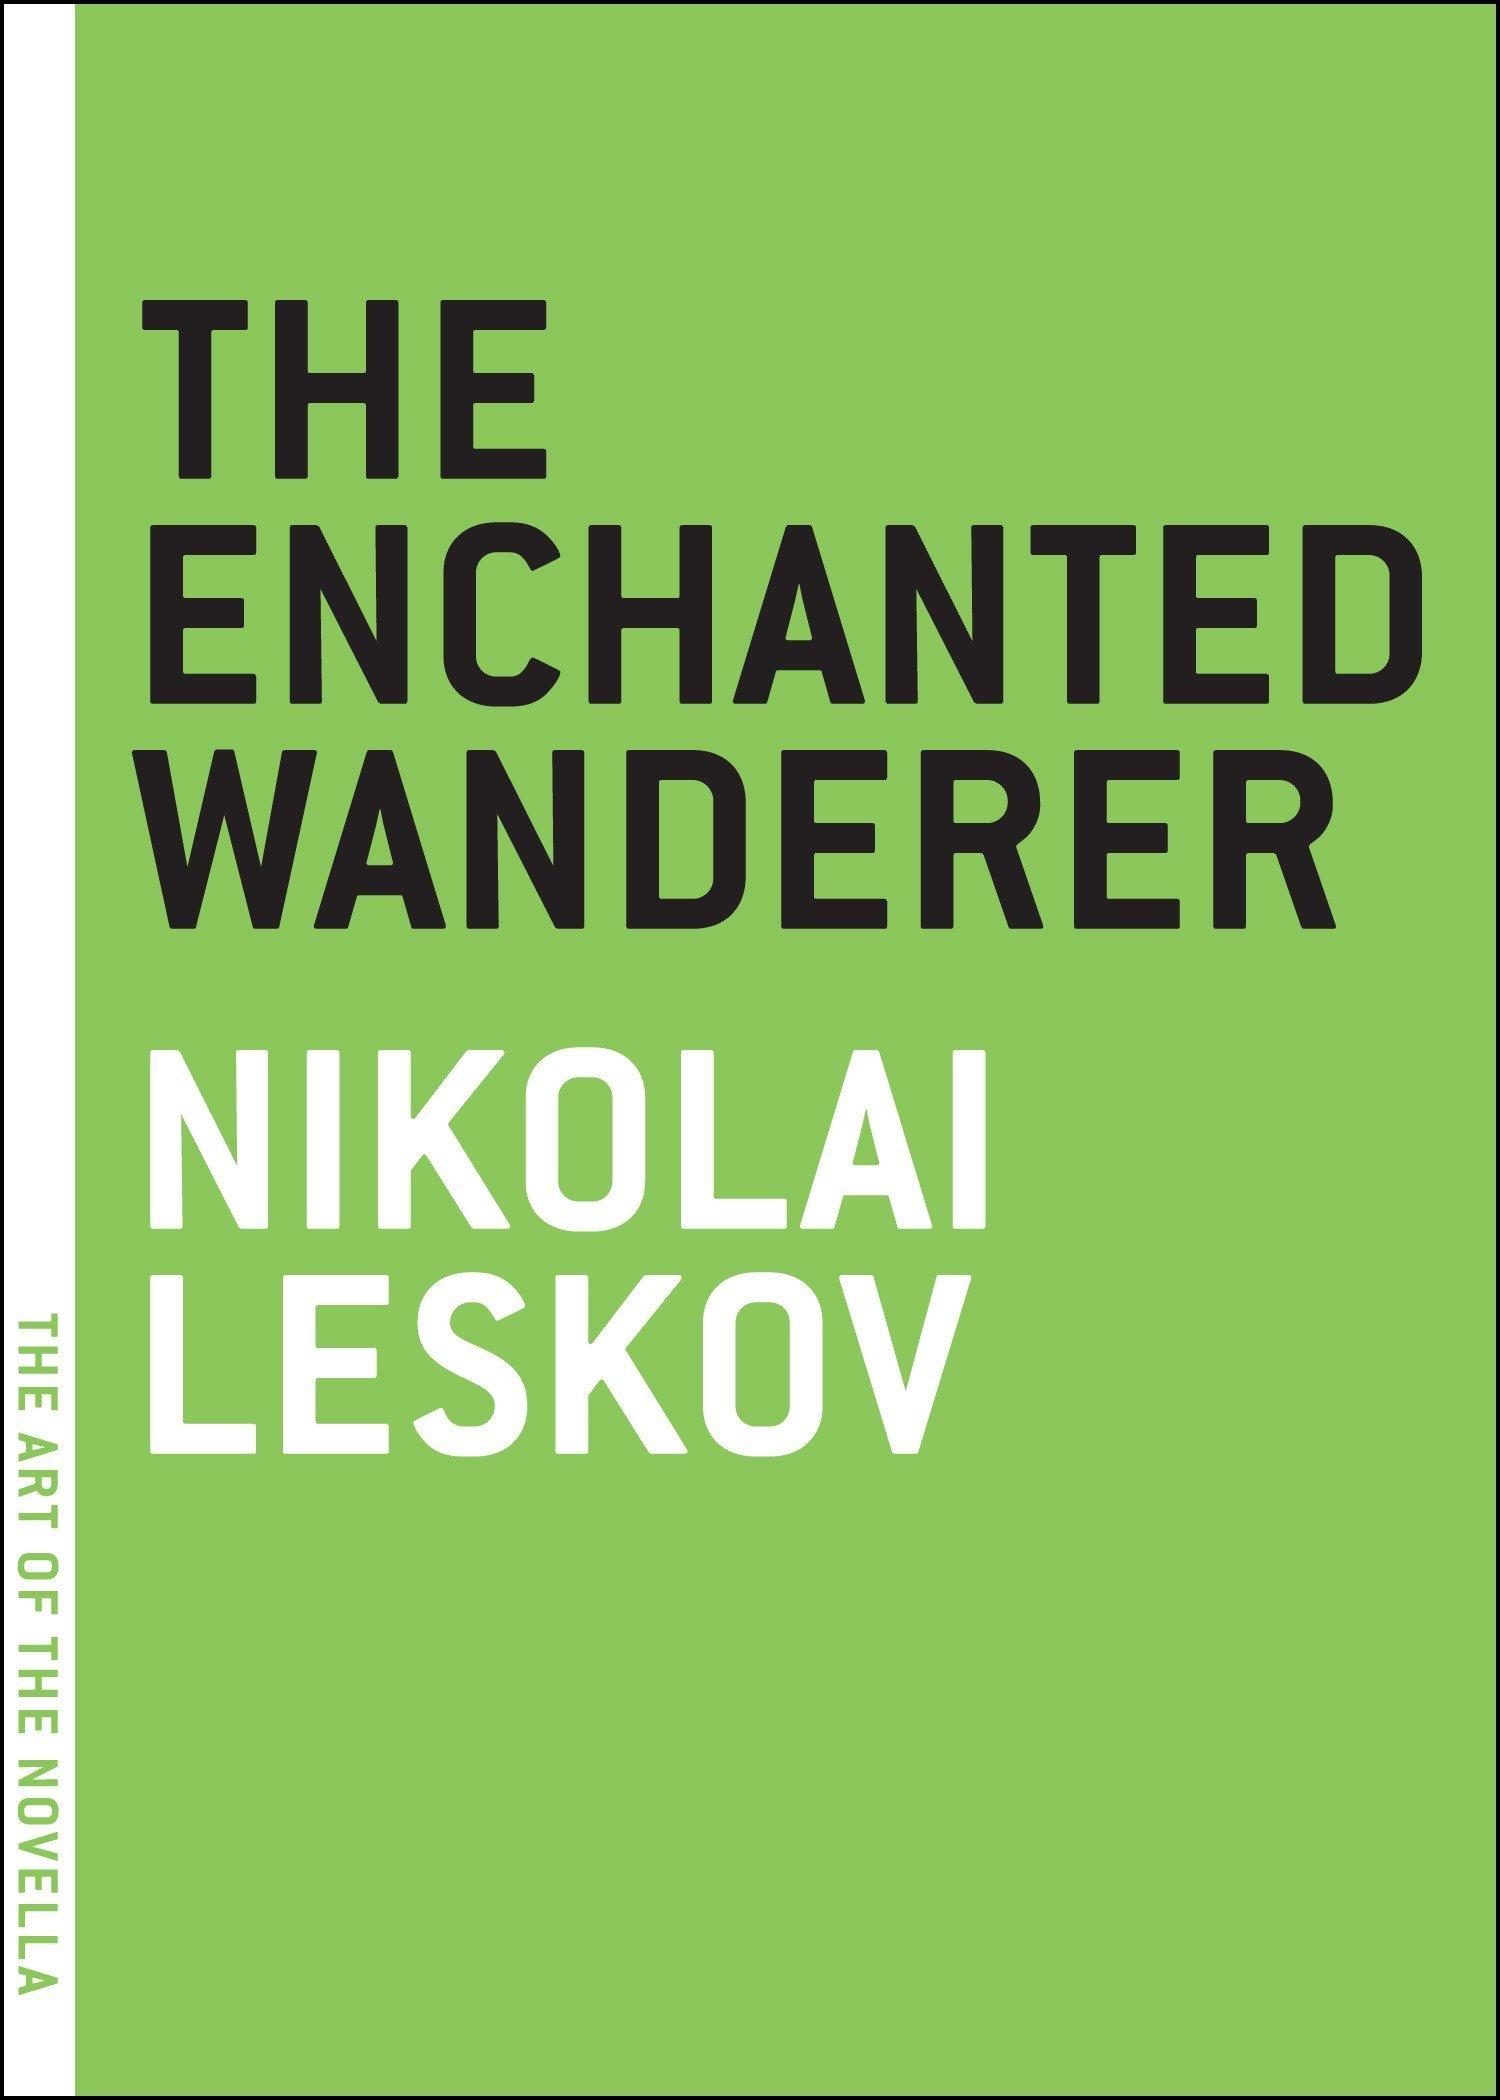 The Enchanted Wanderer (The Art of the Novella) pdf